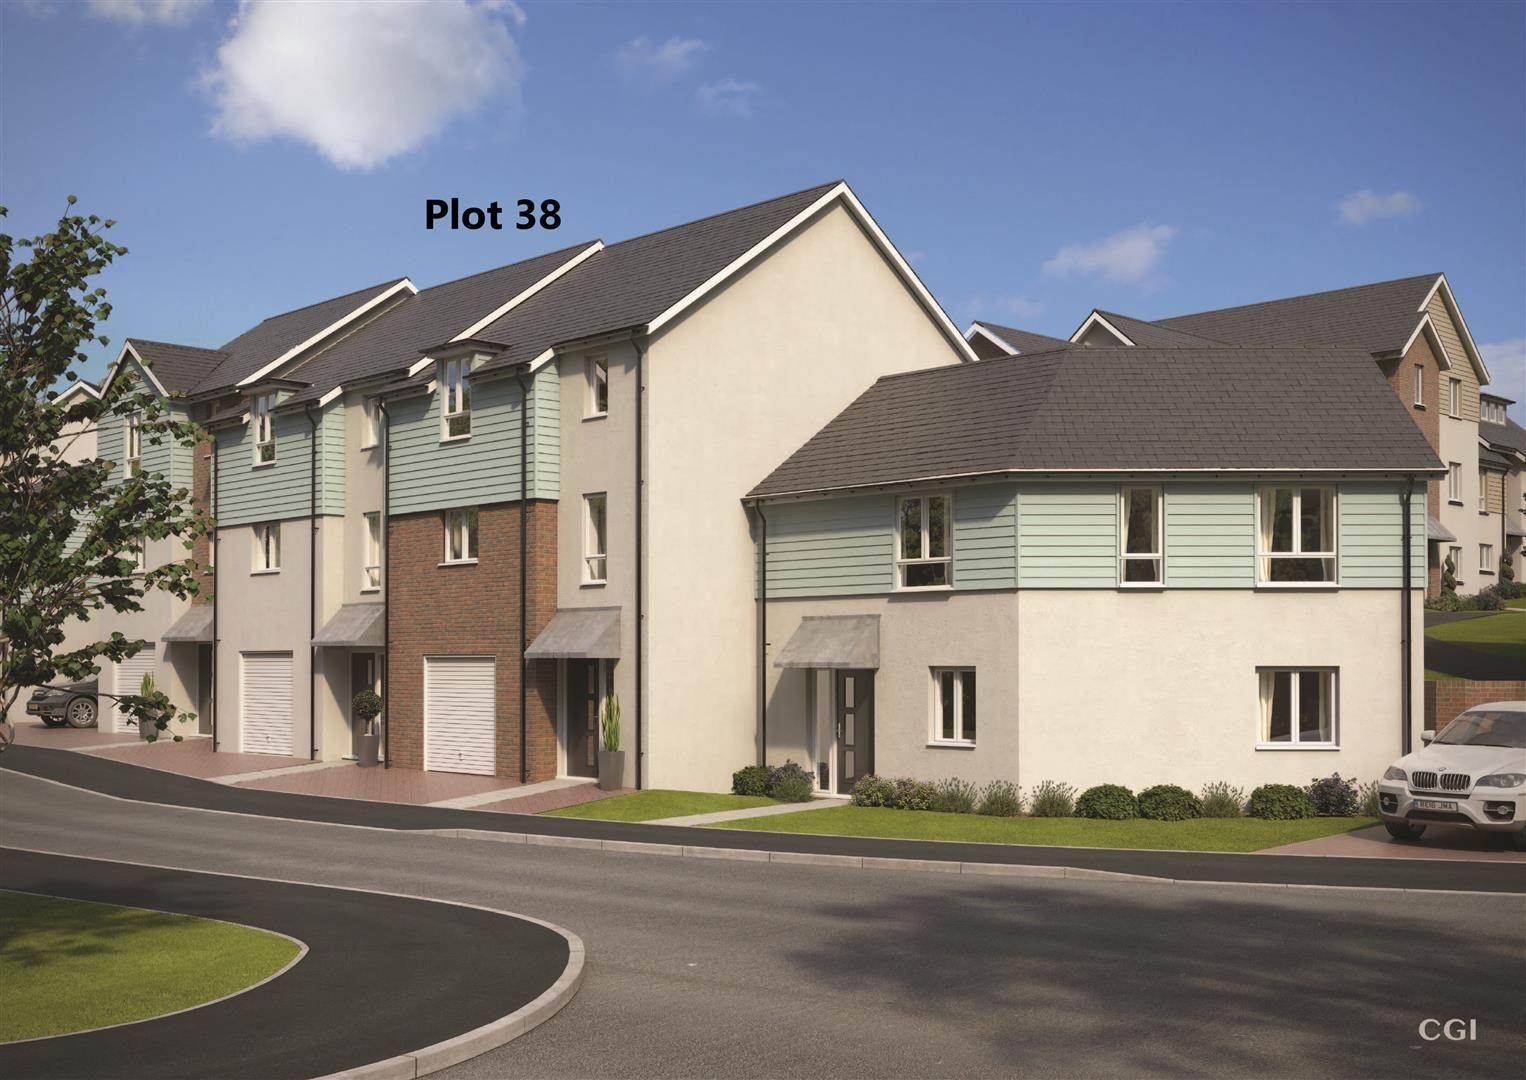 Property photo 1 of 17. Plot 38.Jpg